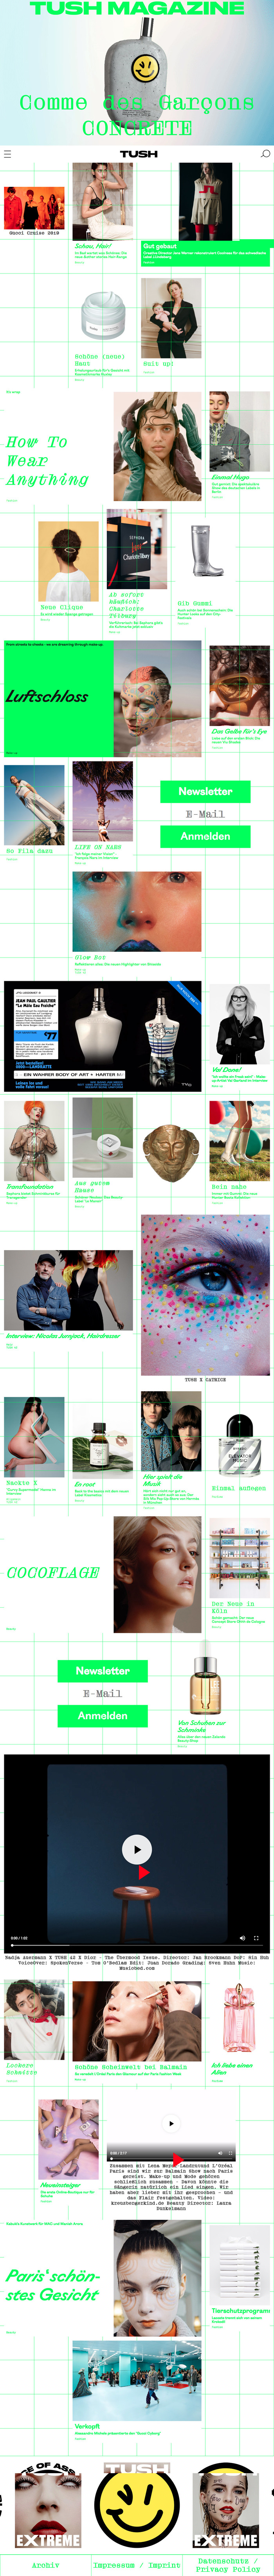 Tush magazine website 2